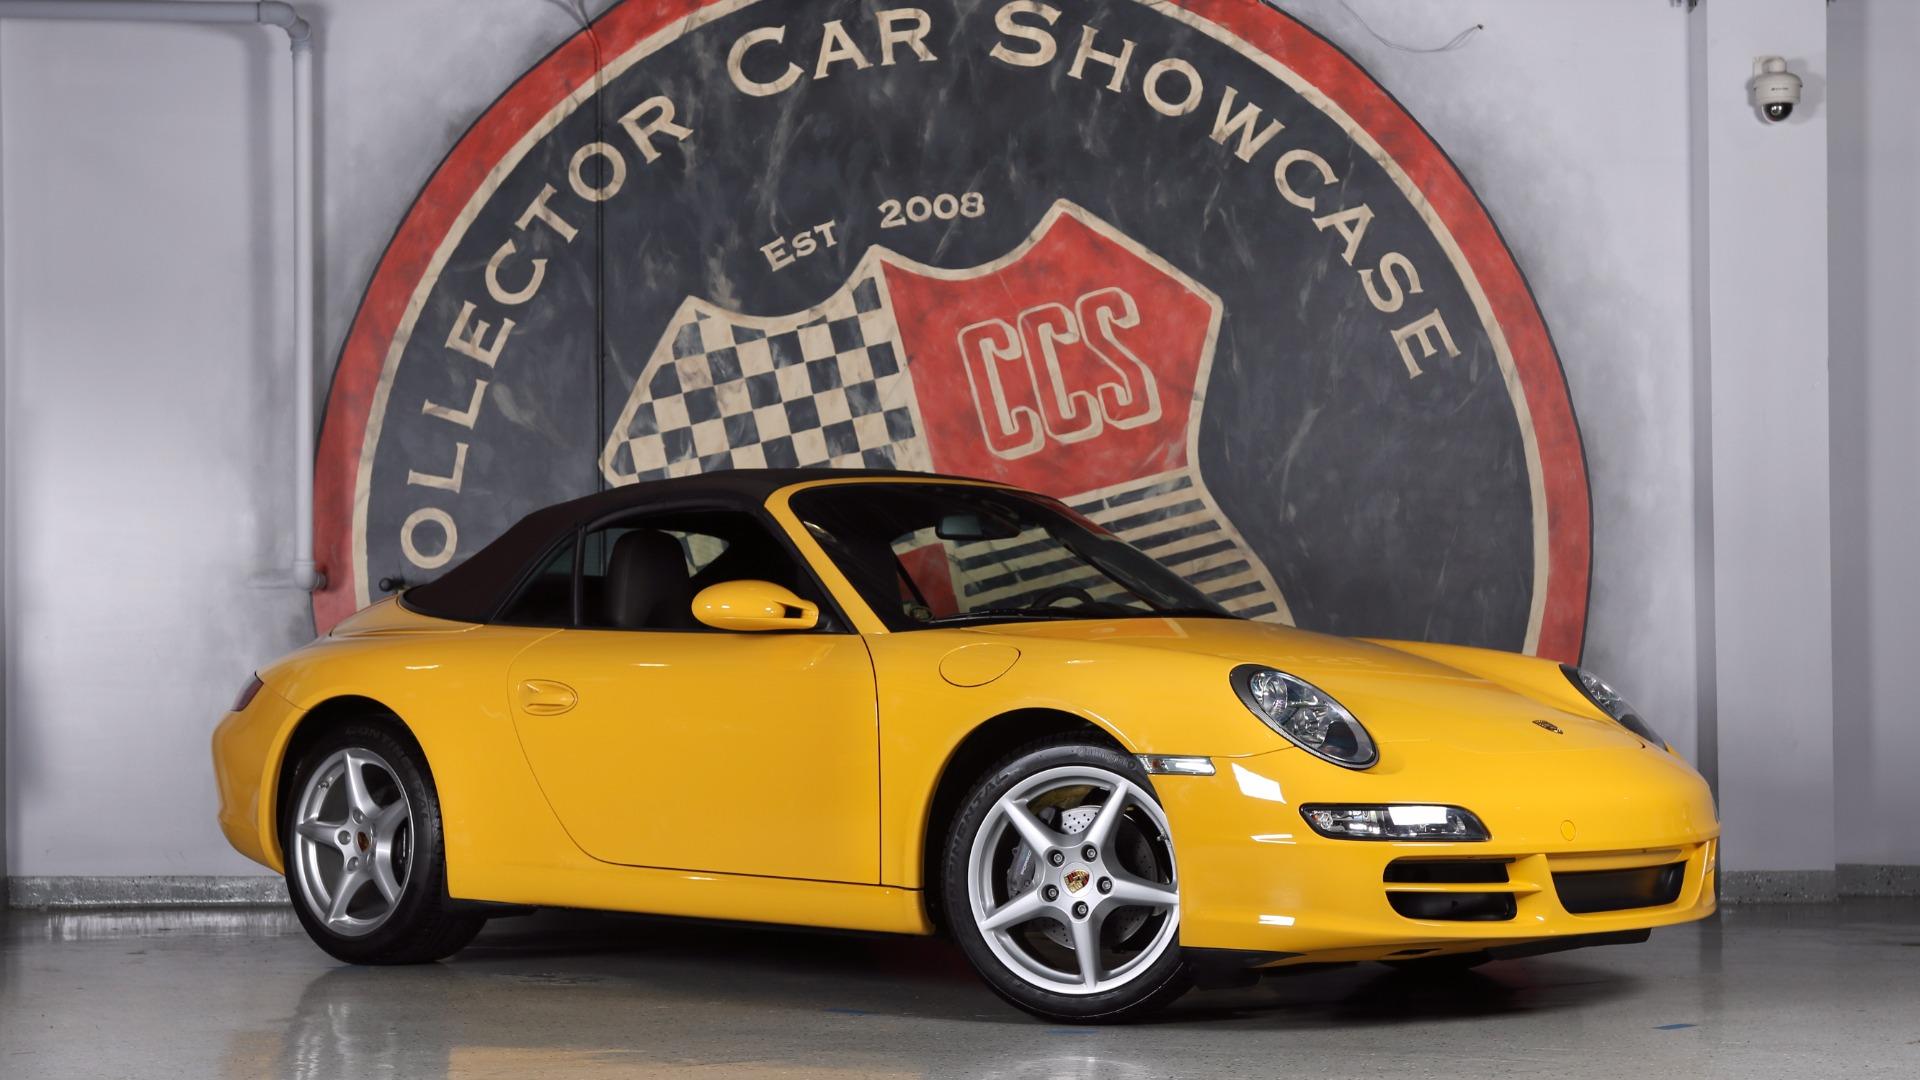 Used 2007 Porsche 911 Carrera Cabriolet | Oyster Bay, NY